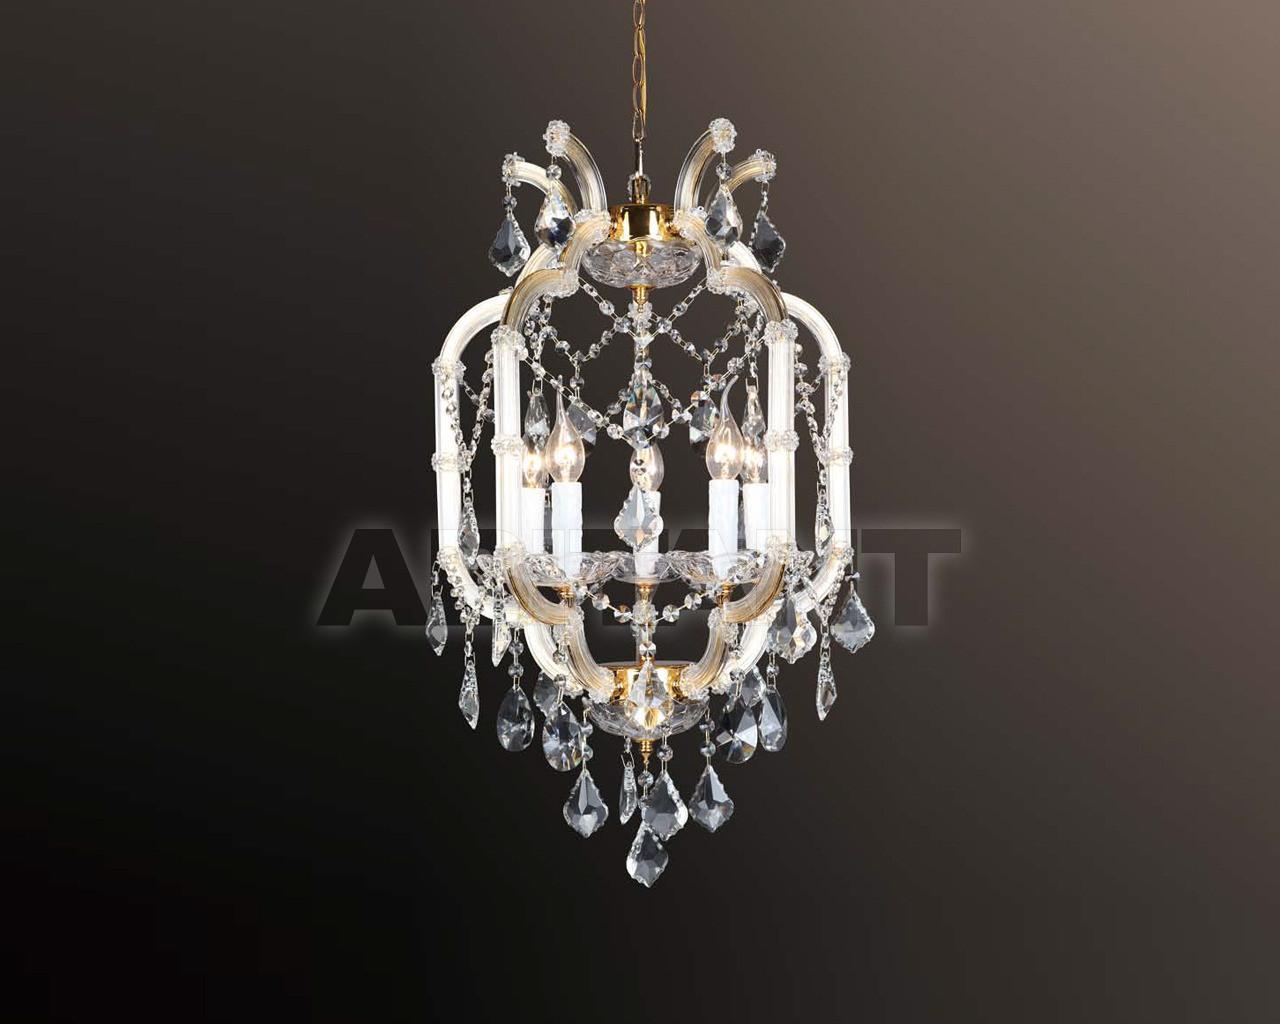 Купить Люстра Crystallux Crystallux 2014 NEWBEAUTY SP5